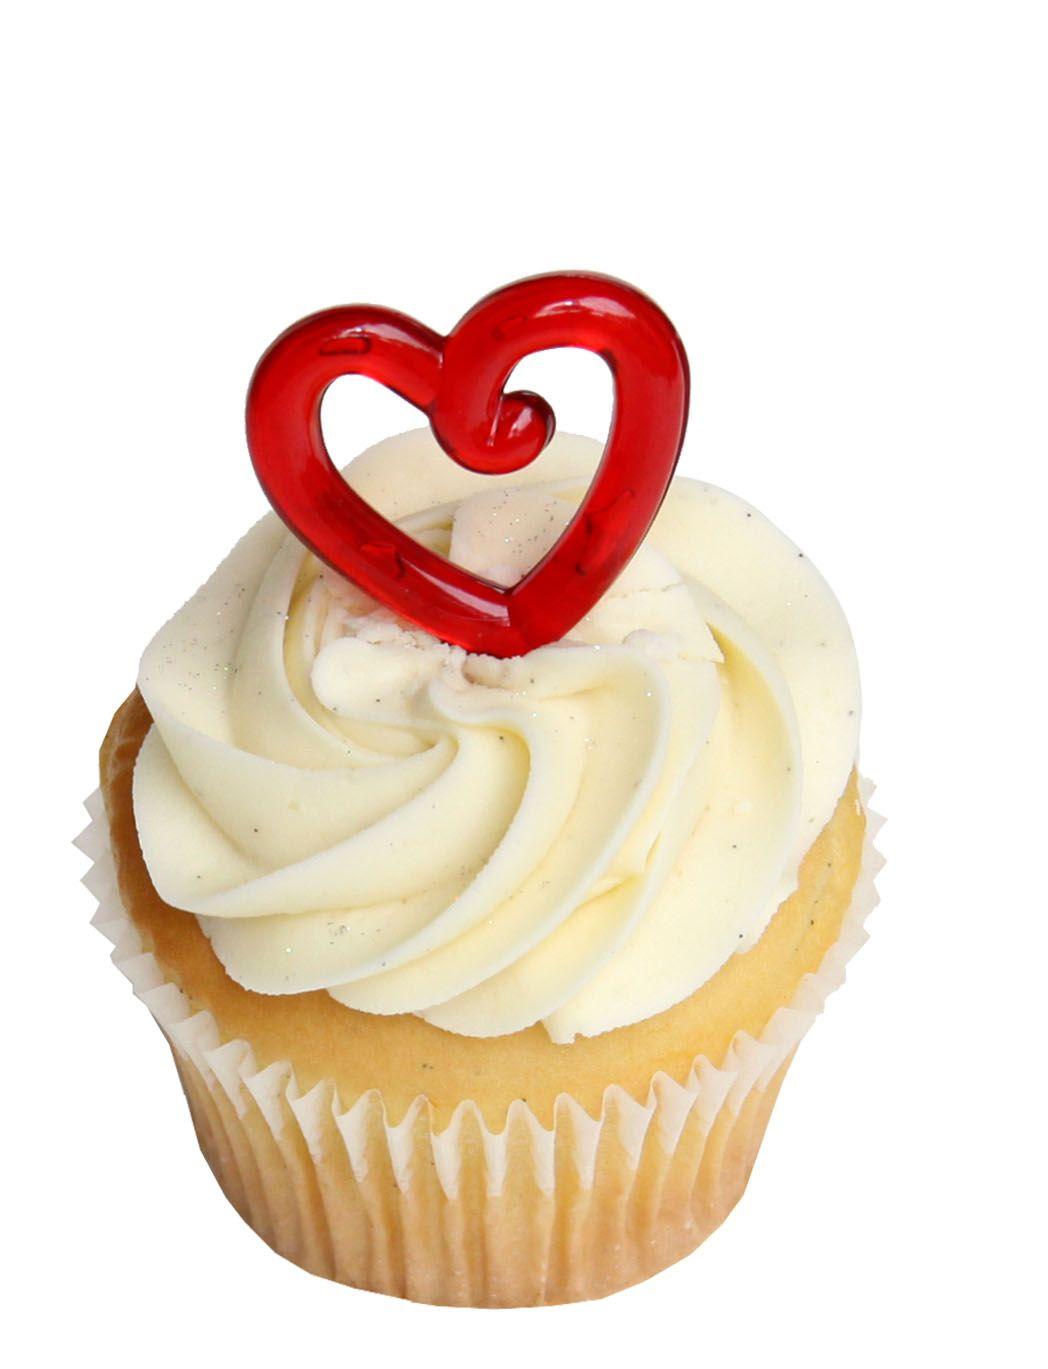 Vanilla cupcake with red heart topper cupcakes vanilla